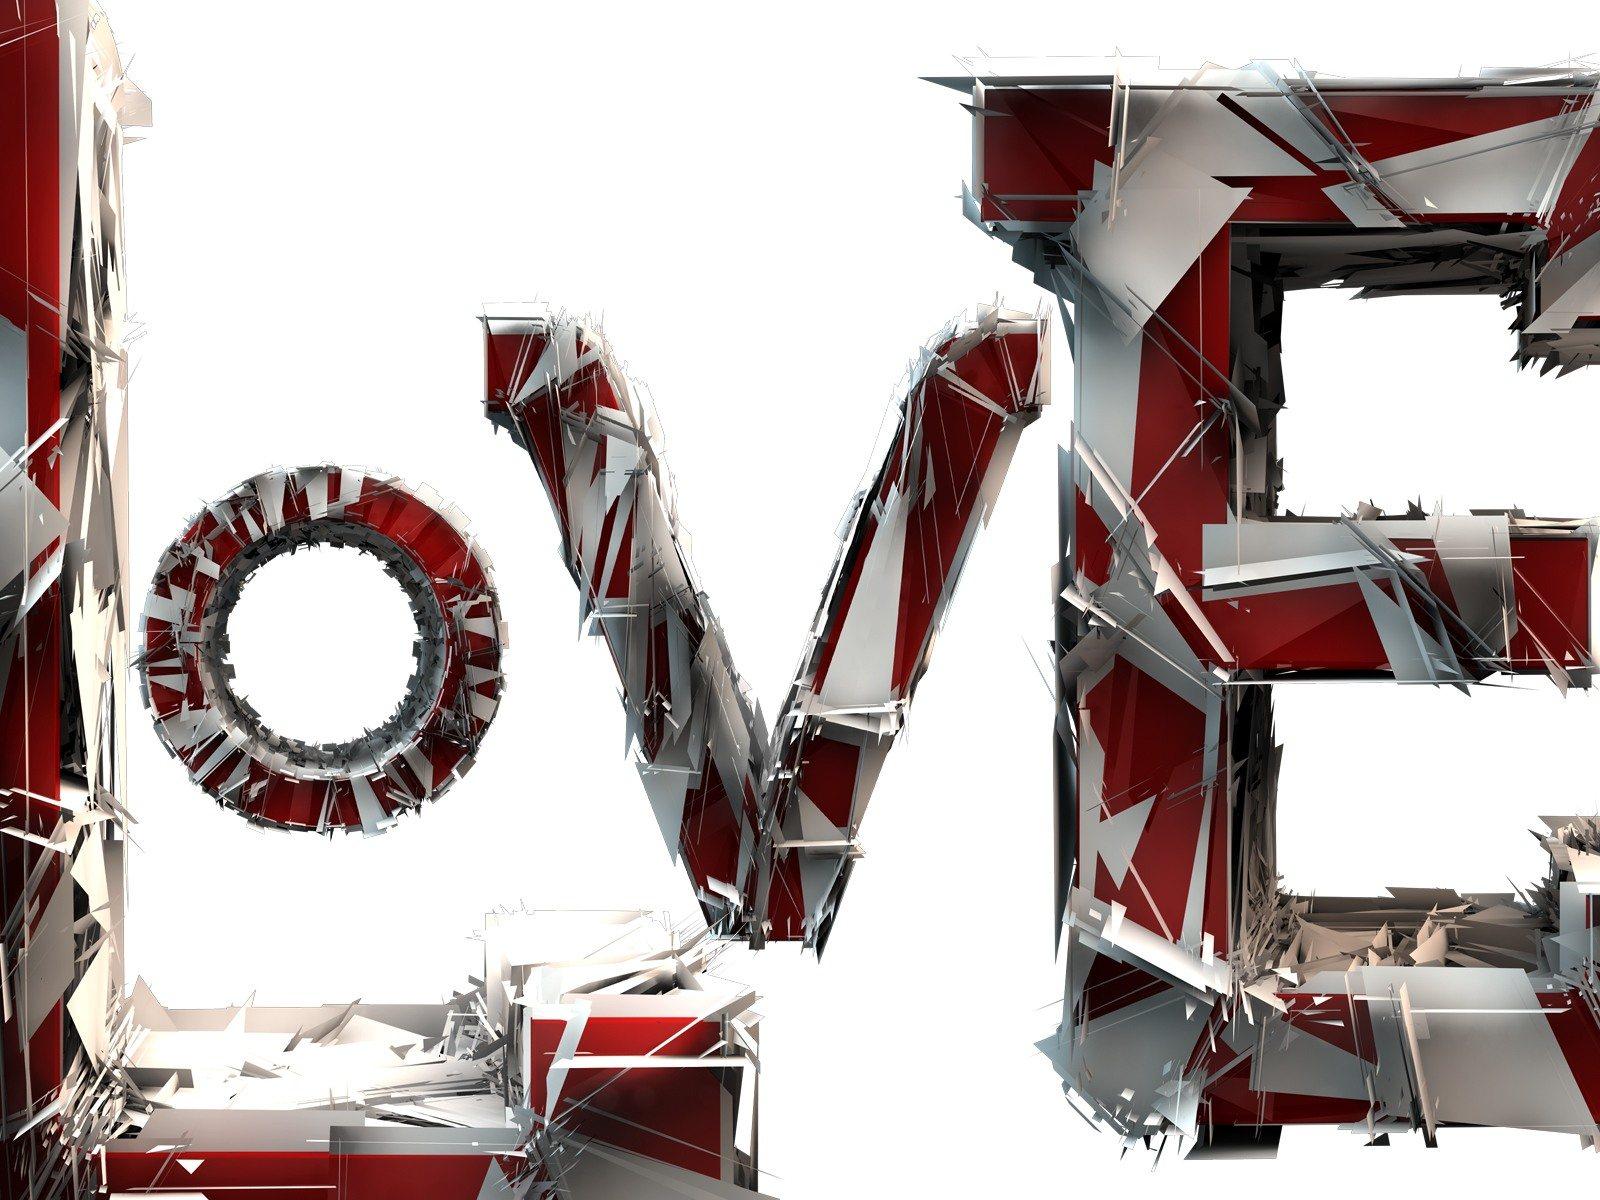 3d love life 3 desktop wallpaper - Love life wallpaper hd ...